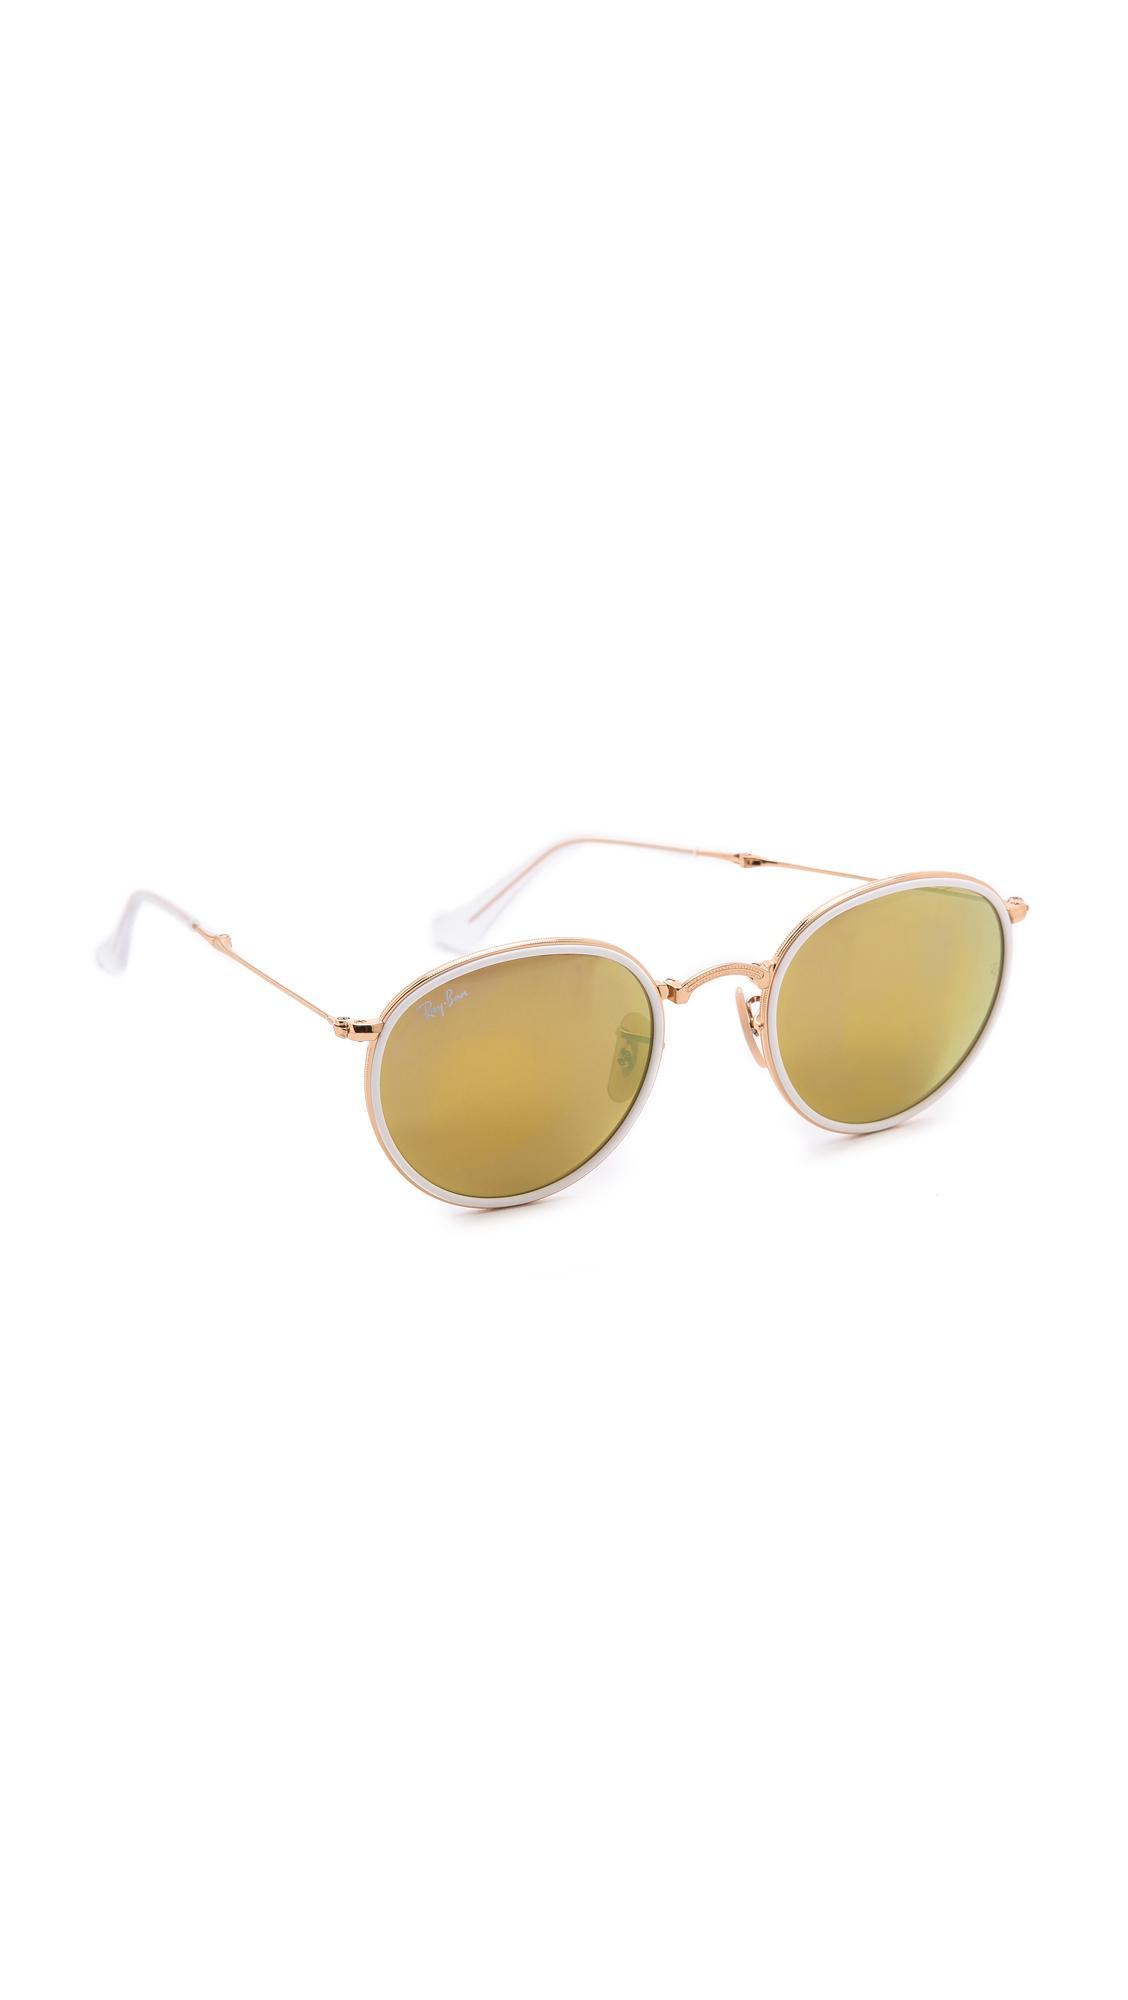 ray ban icon round wire sunglasses